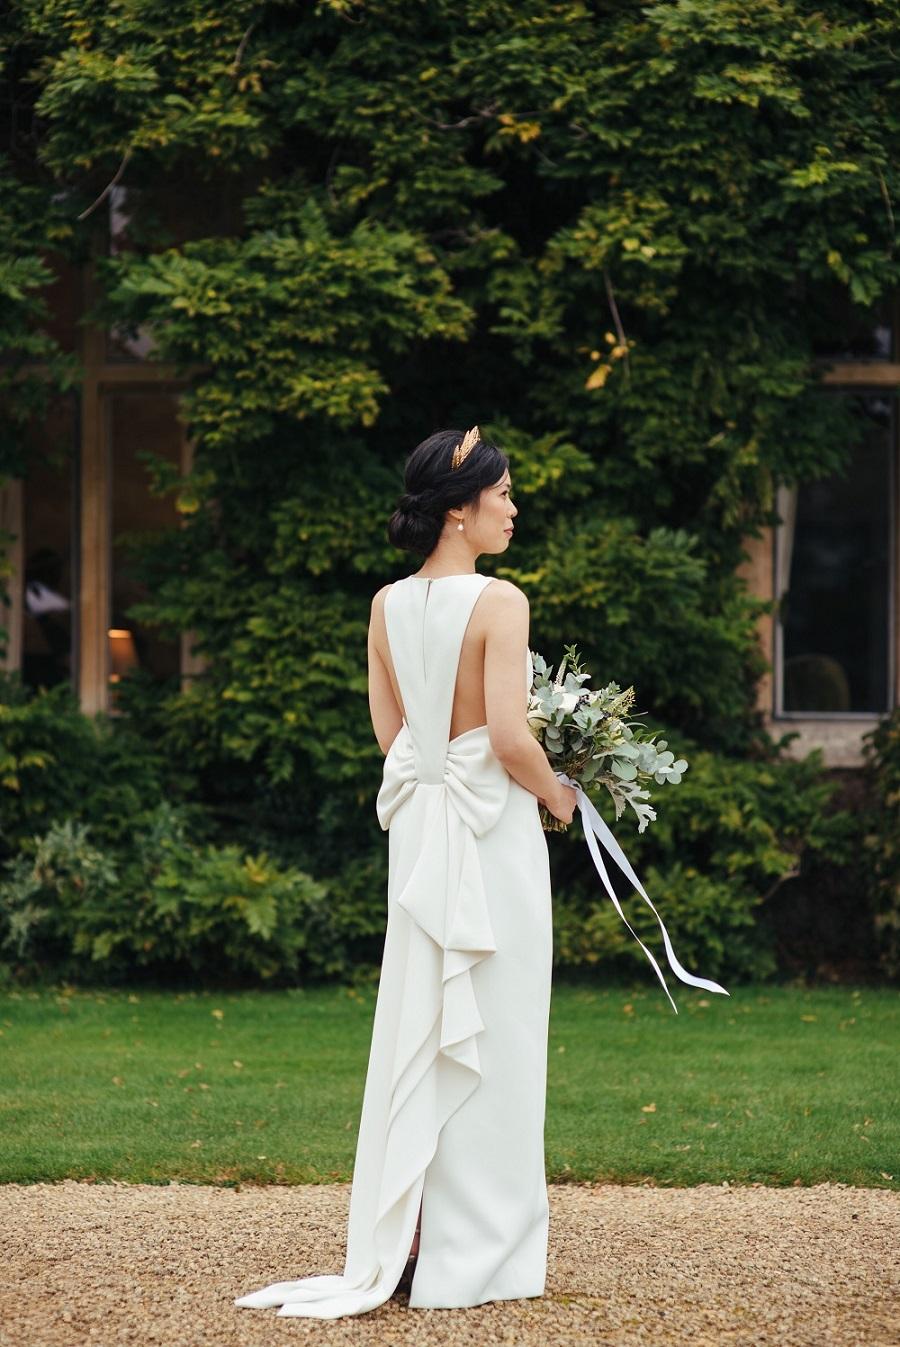 Matt & Liz from Elizabeth Weddings, photo by Cat Beardsley Photography on English Wedding Blog (40)